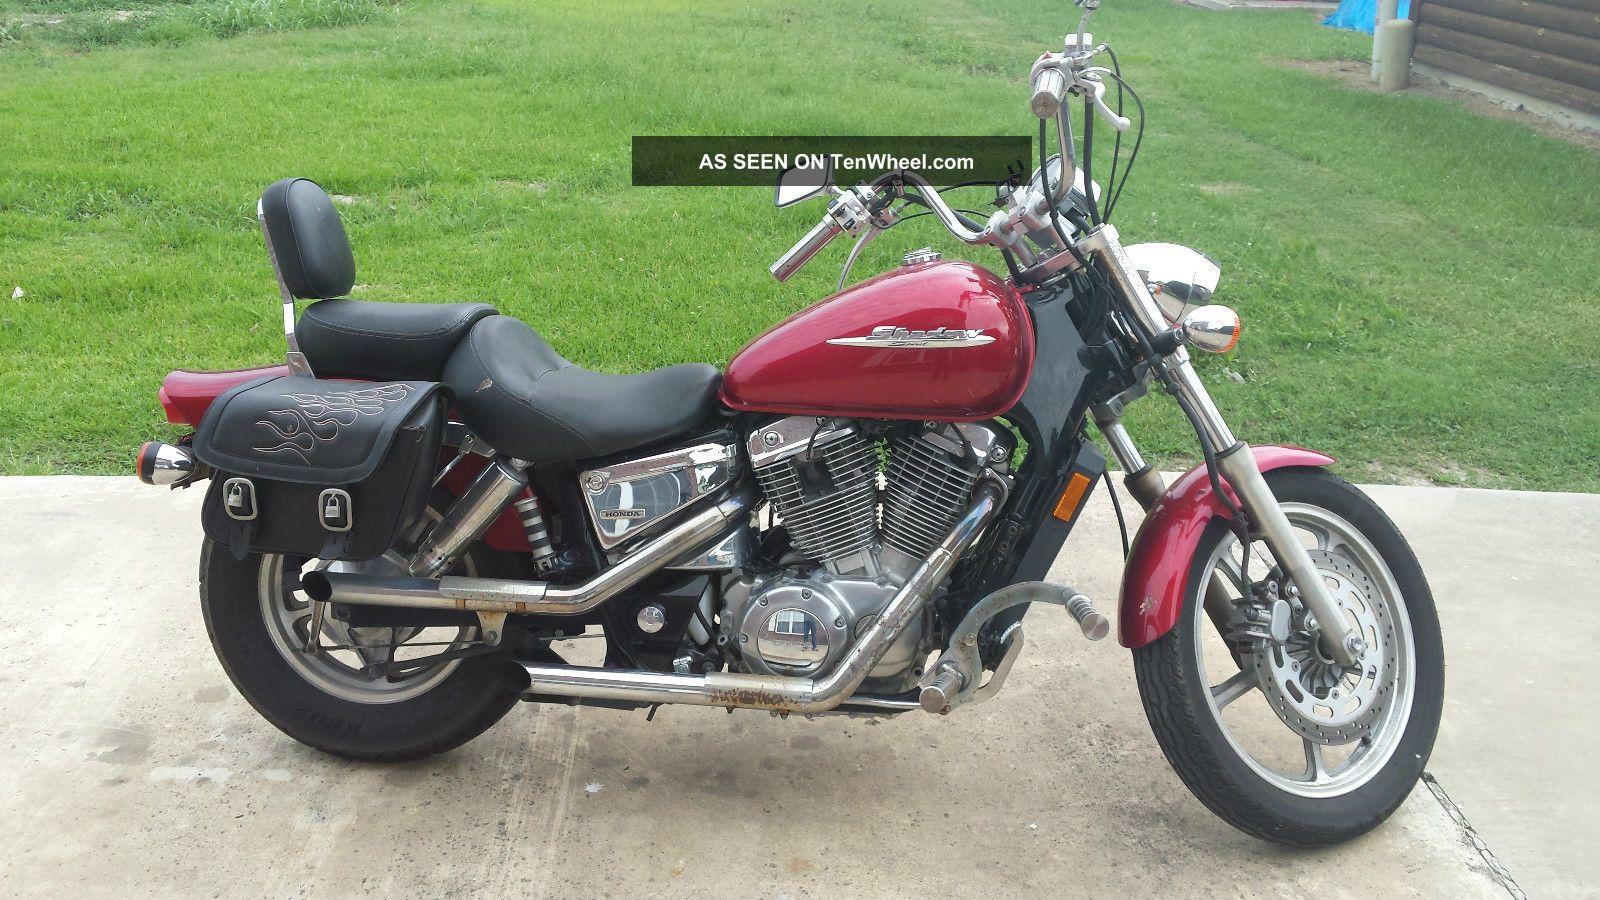 2005 Honda Shadow Motorcycle 1100 Spirit Shadow photo